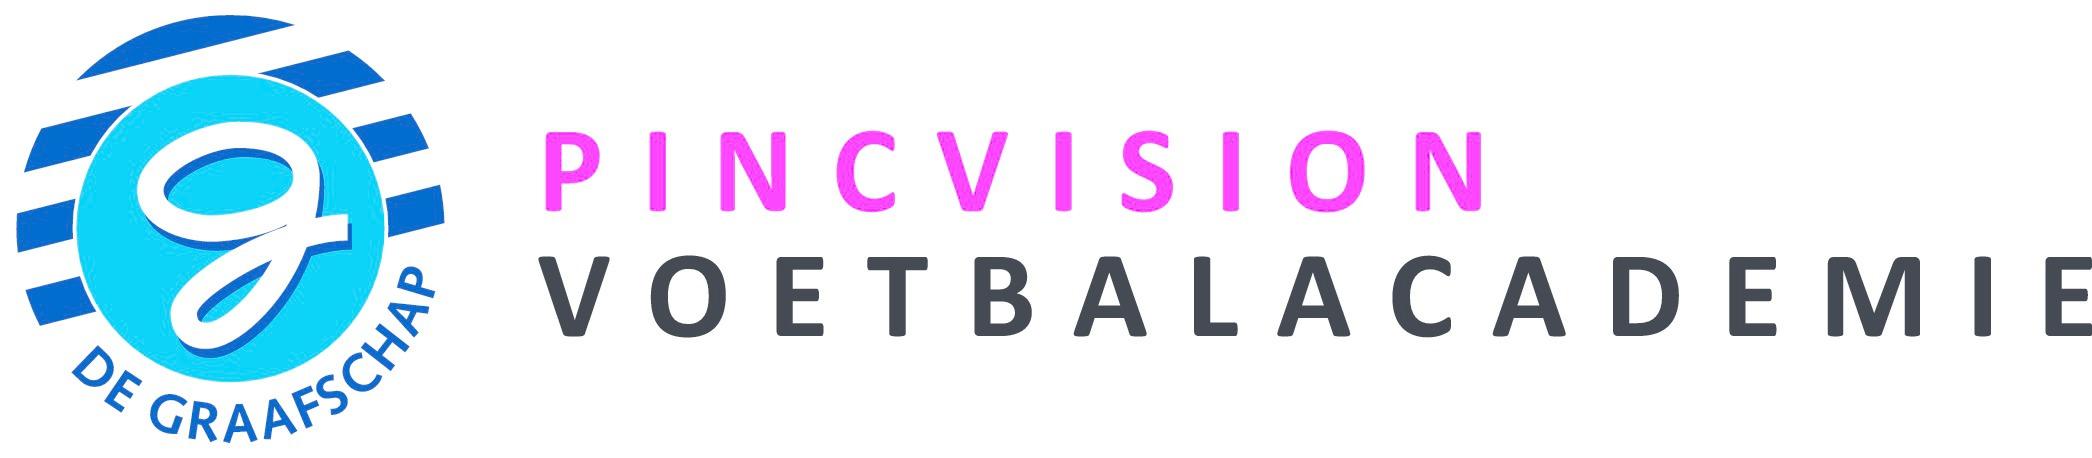 Logo_Pincvision_Voetbalacademie_RGB.eps.jpg#asset:20659:url